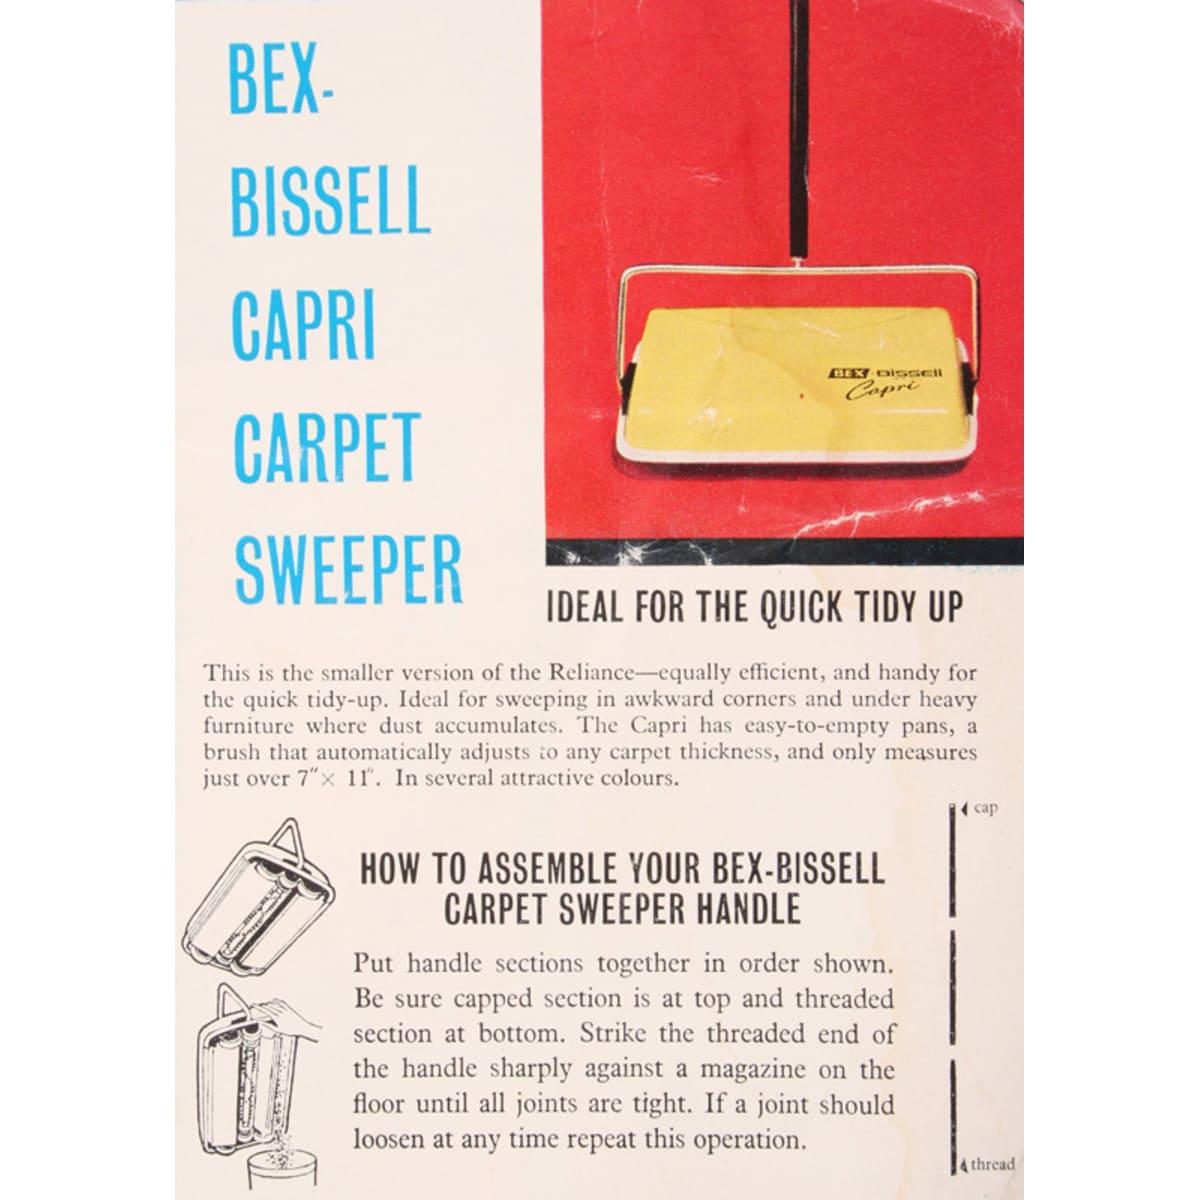 Bex-Bissel Sweeper - A4 (210 x 297mm)